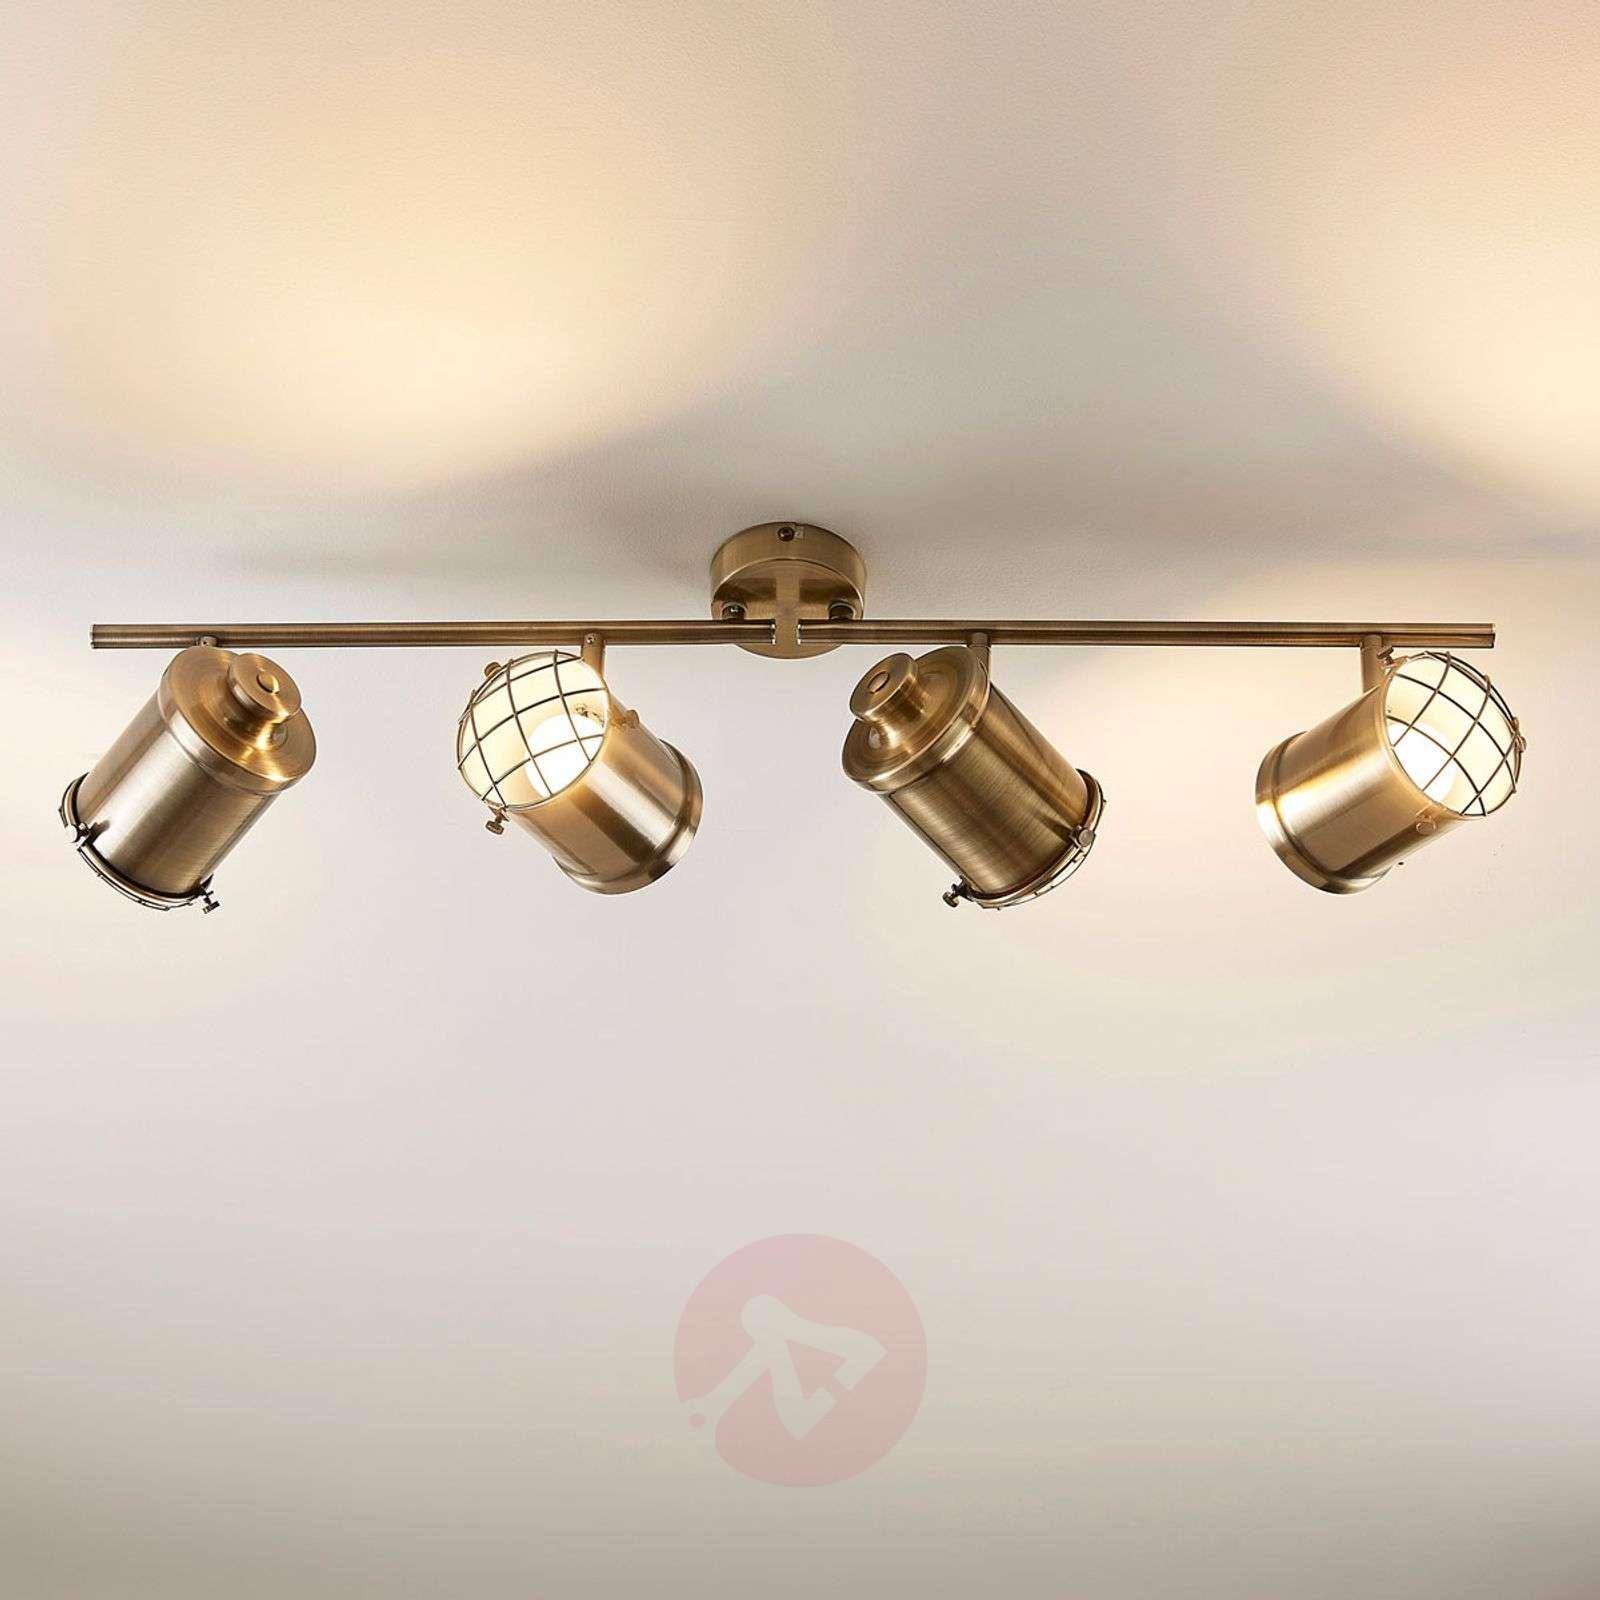 4-lamppuinen LED-kattovalaisin Ebbi, easydim-9621231-02